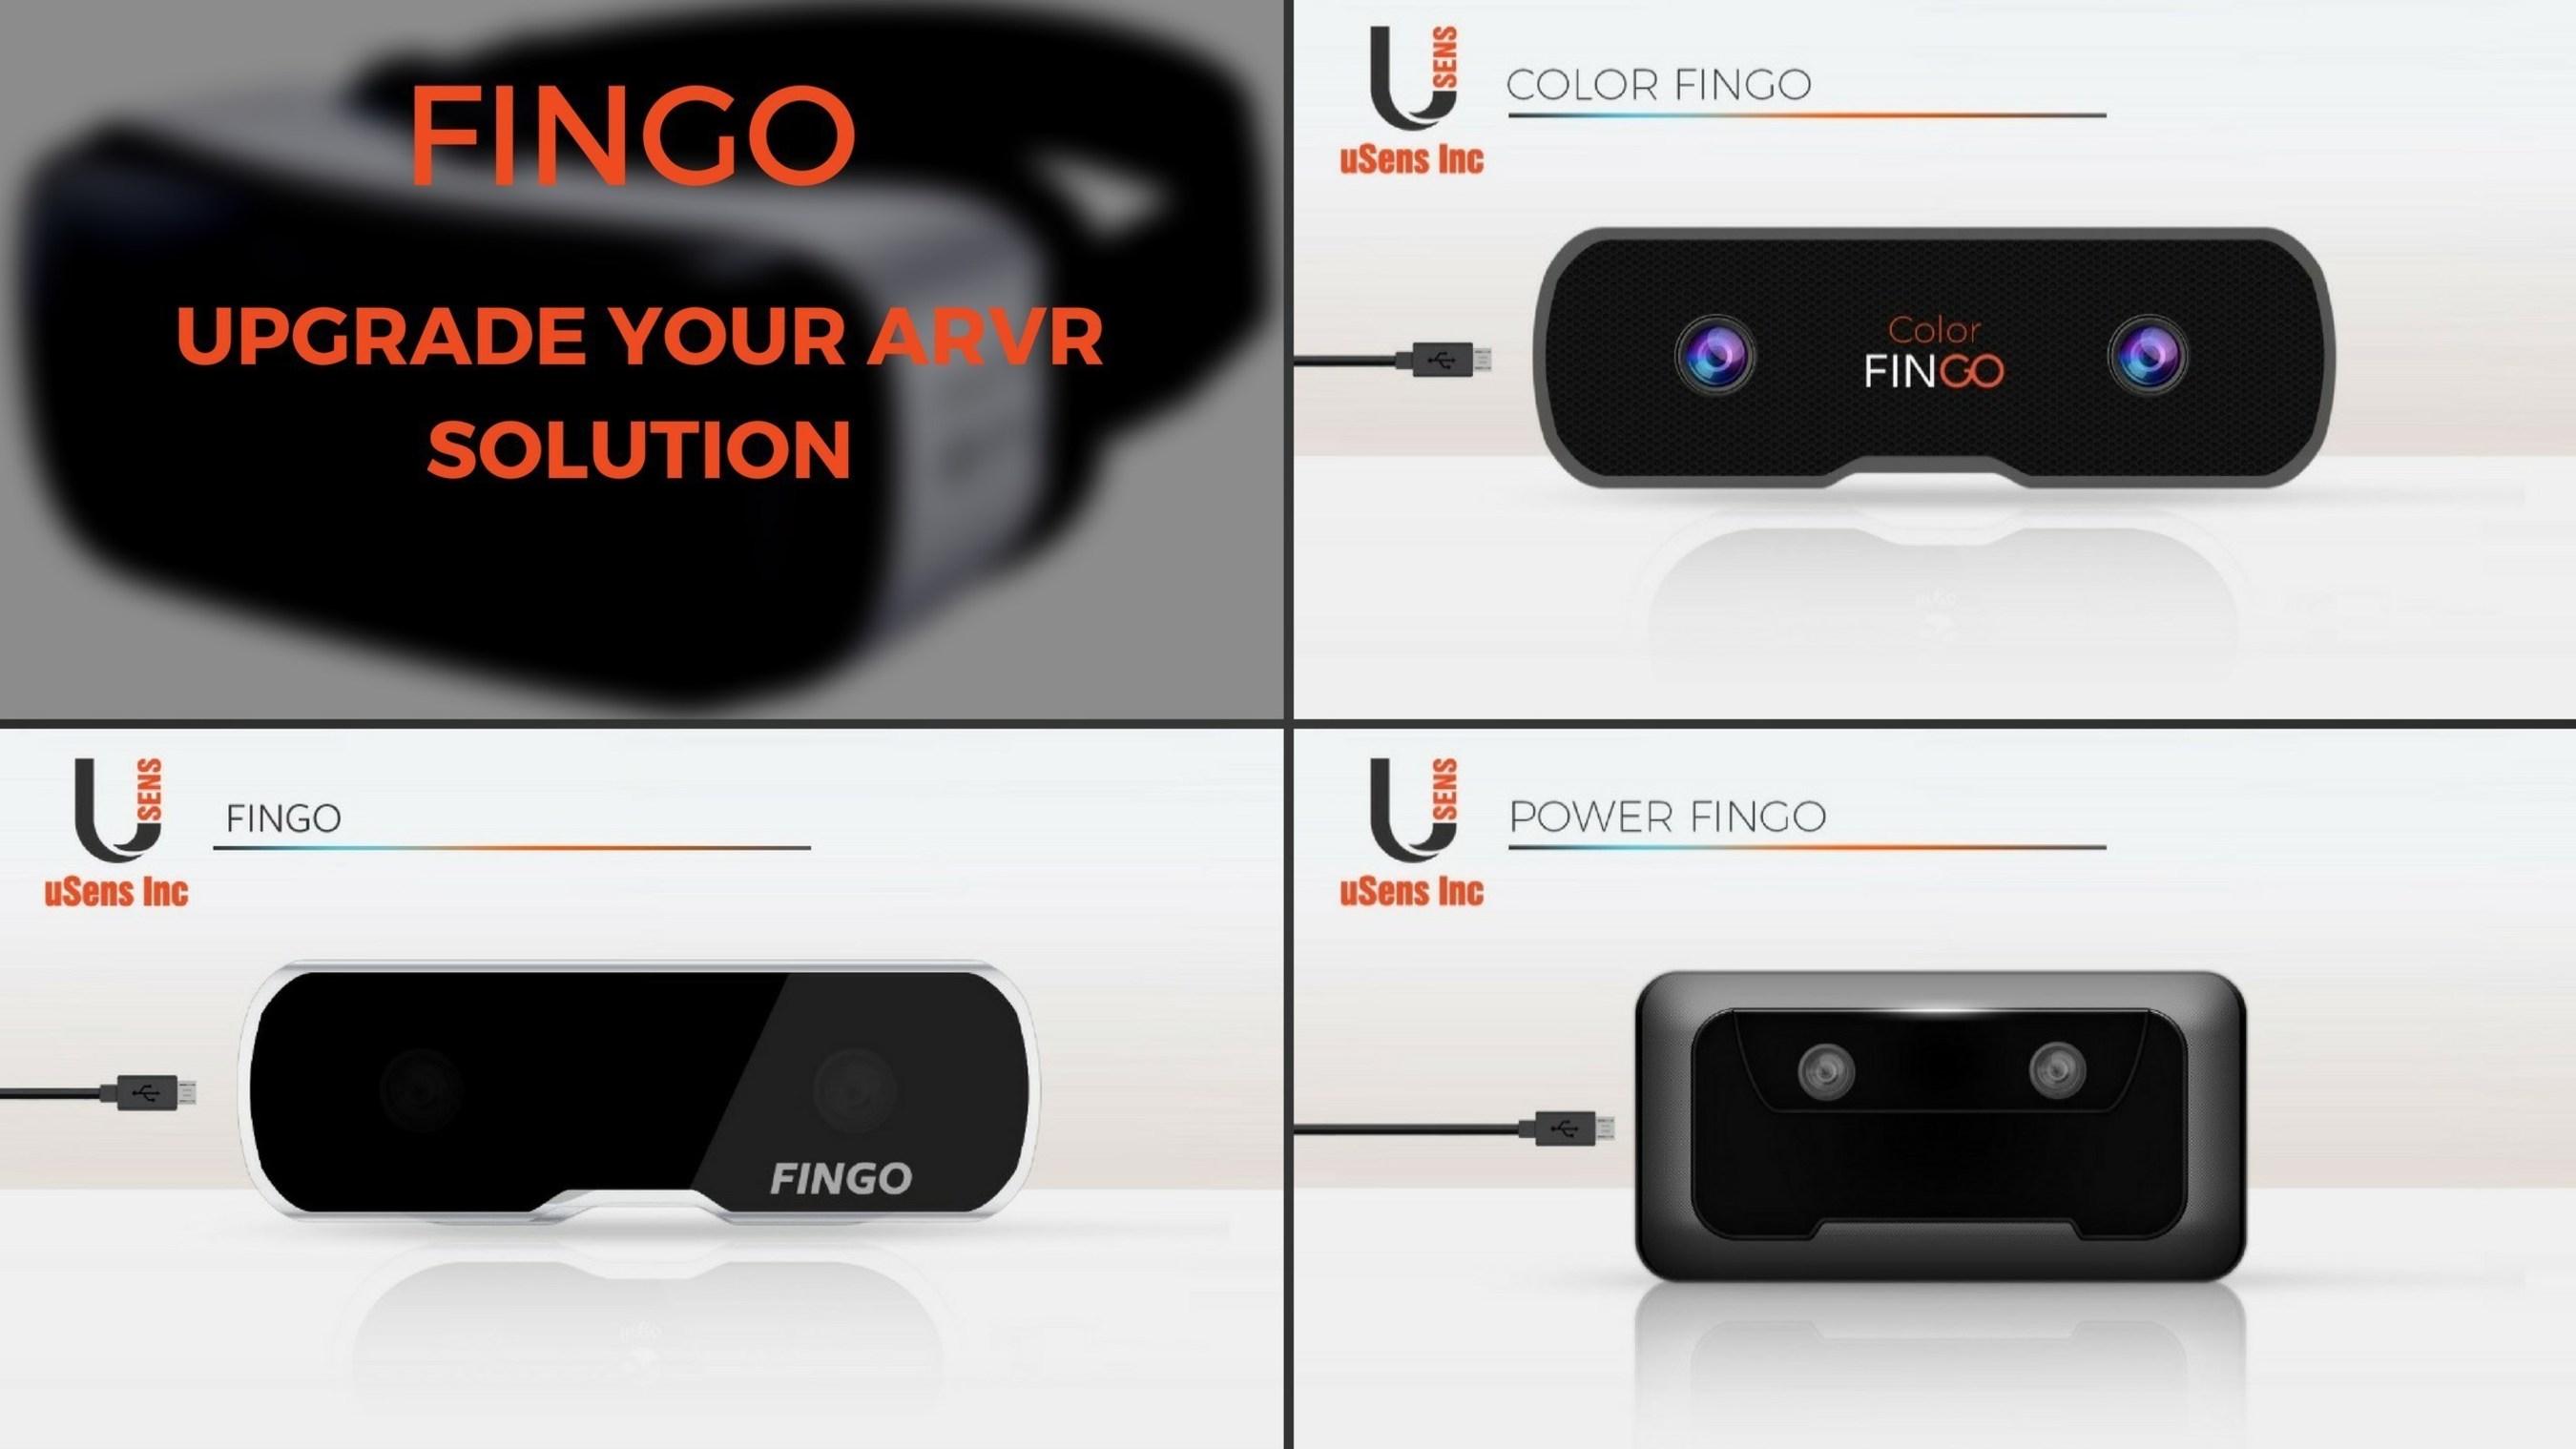 uSens New Fingo Hardware Series